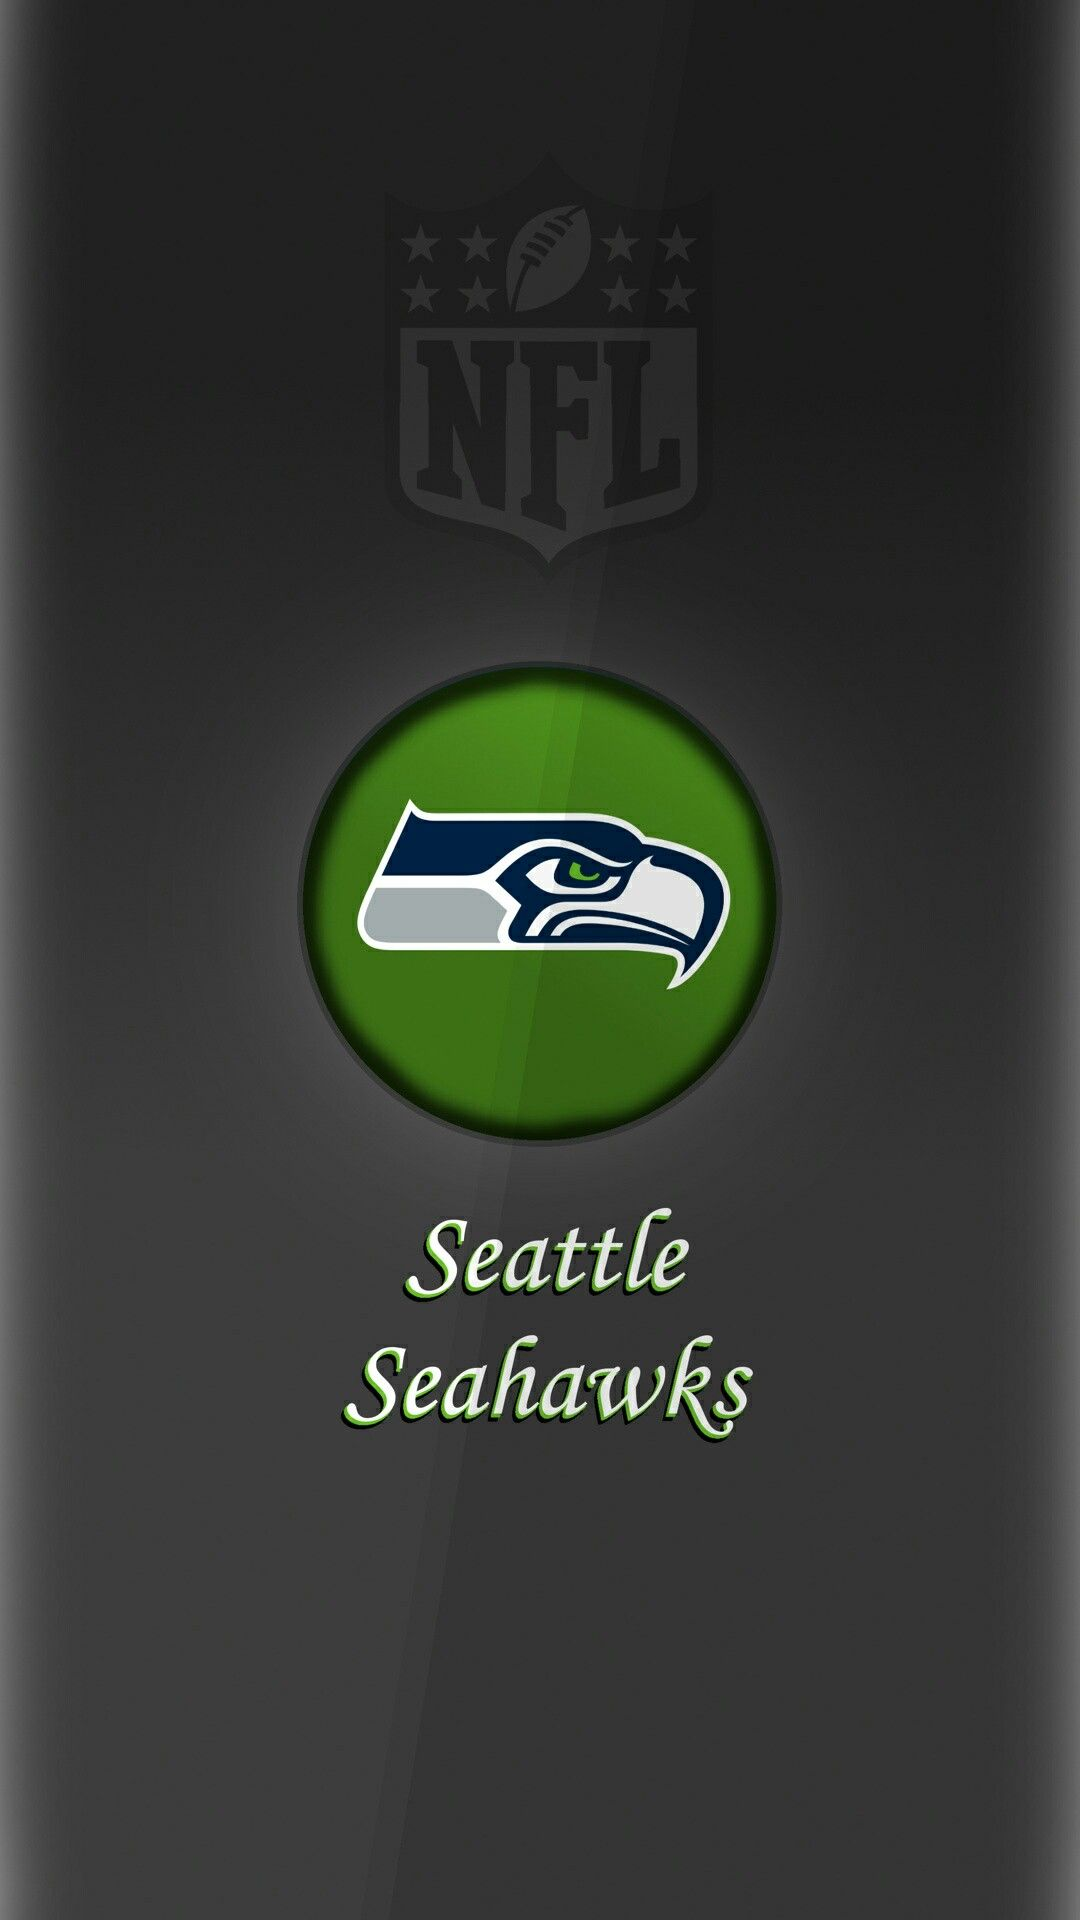 c2b7ff2565 Pin by Abbyabbotter on Seattle Seahawks Crafts